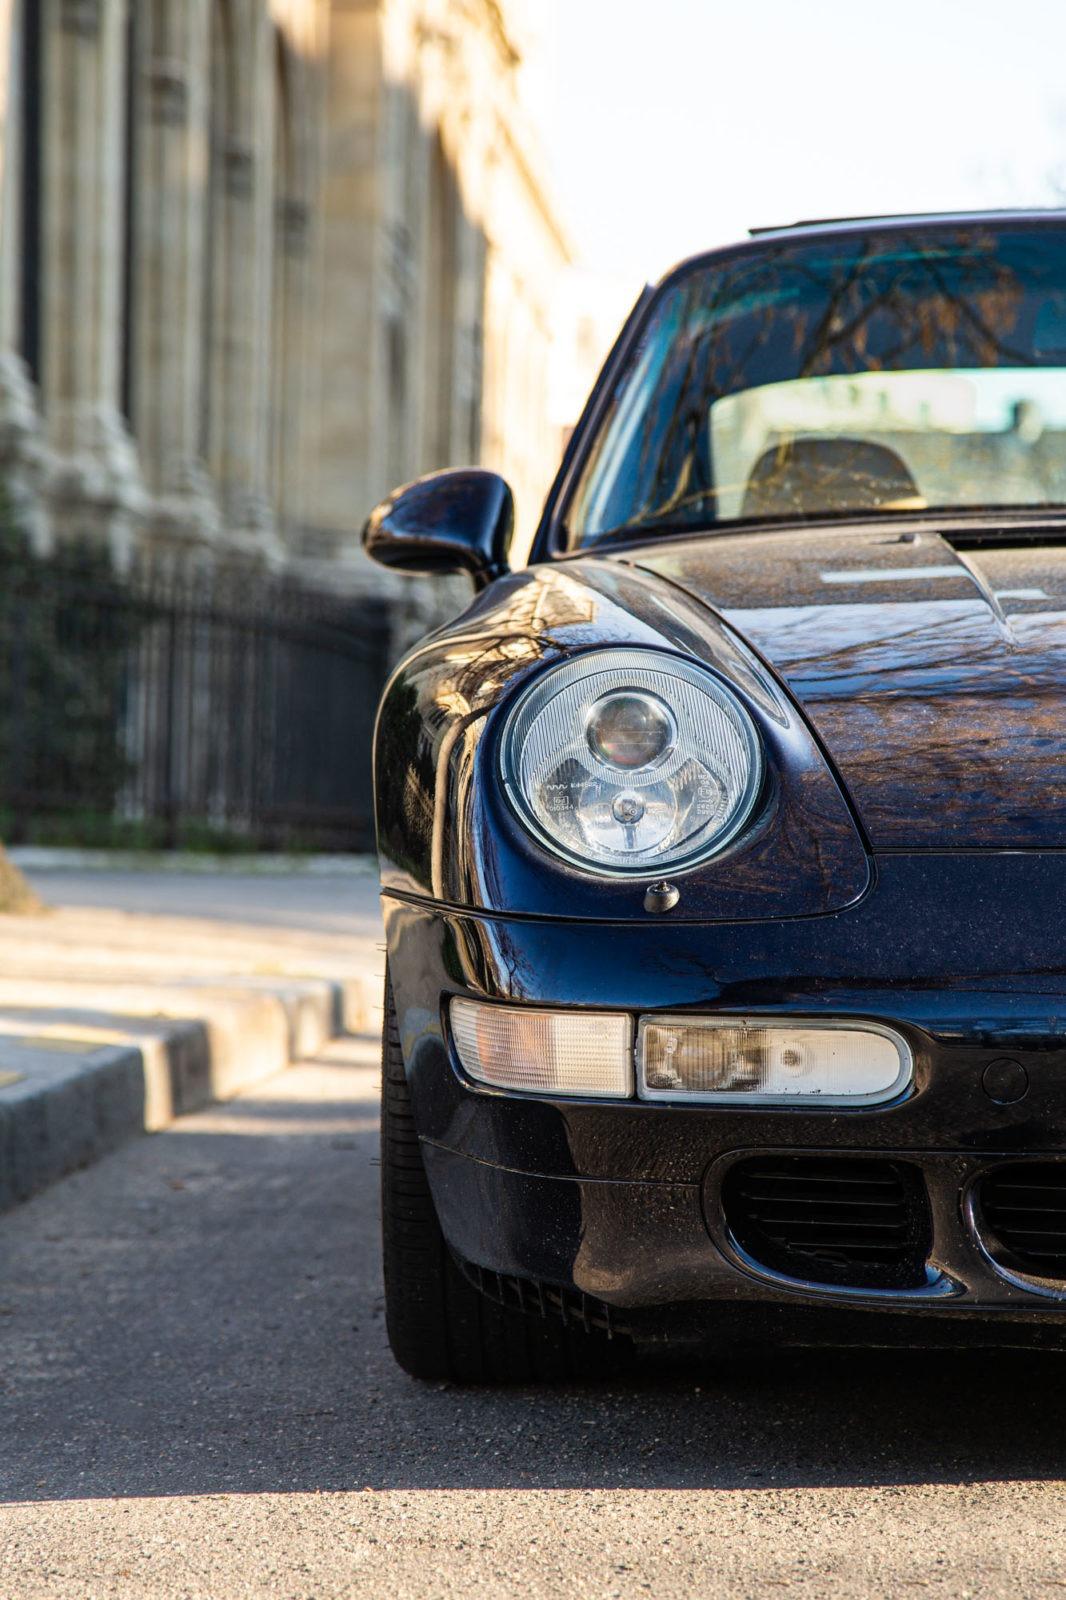 Porsche 911 Type 993 Turbo - Optique